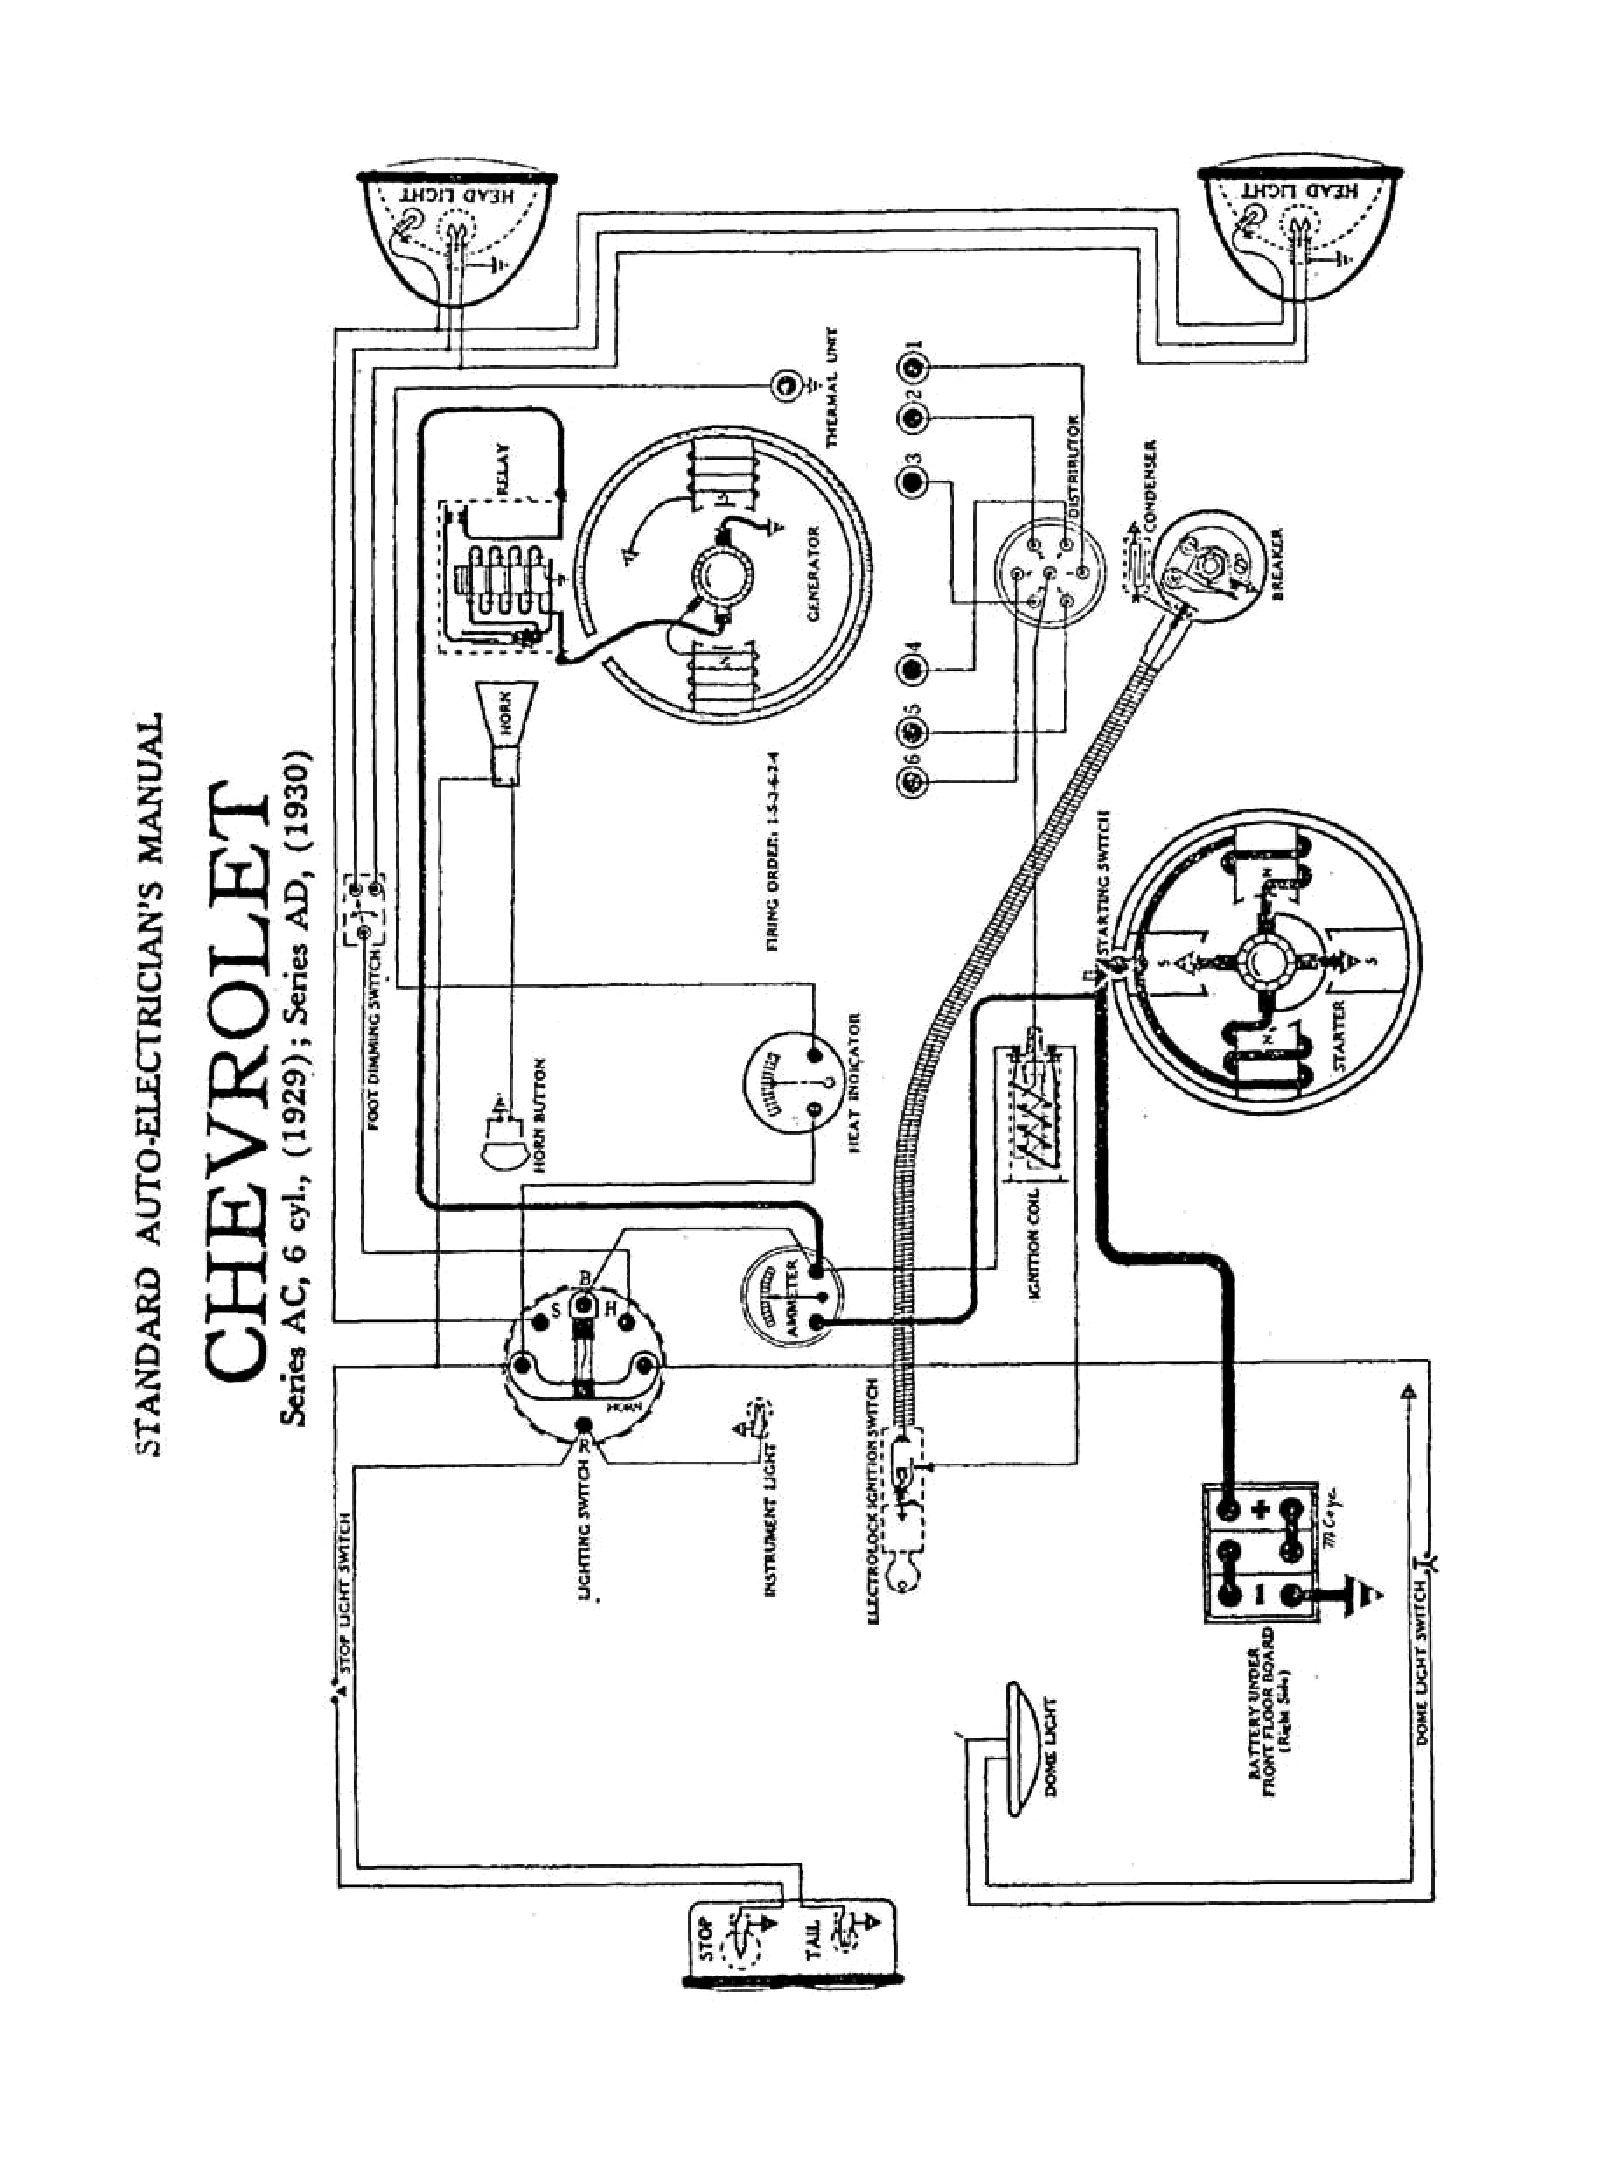 1931 Ford Wiring Diagram - wiring diagram structure proper -  proper.ashtonmethodist.co.ukashtonmethodist.co.uk